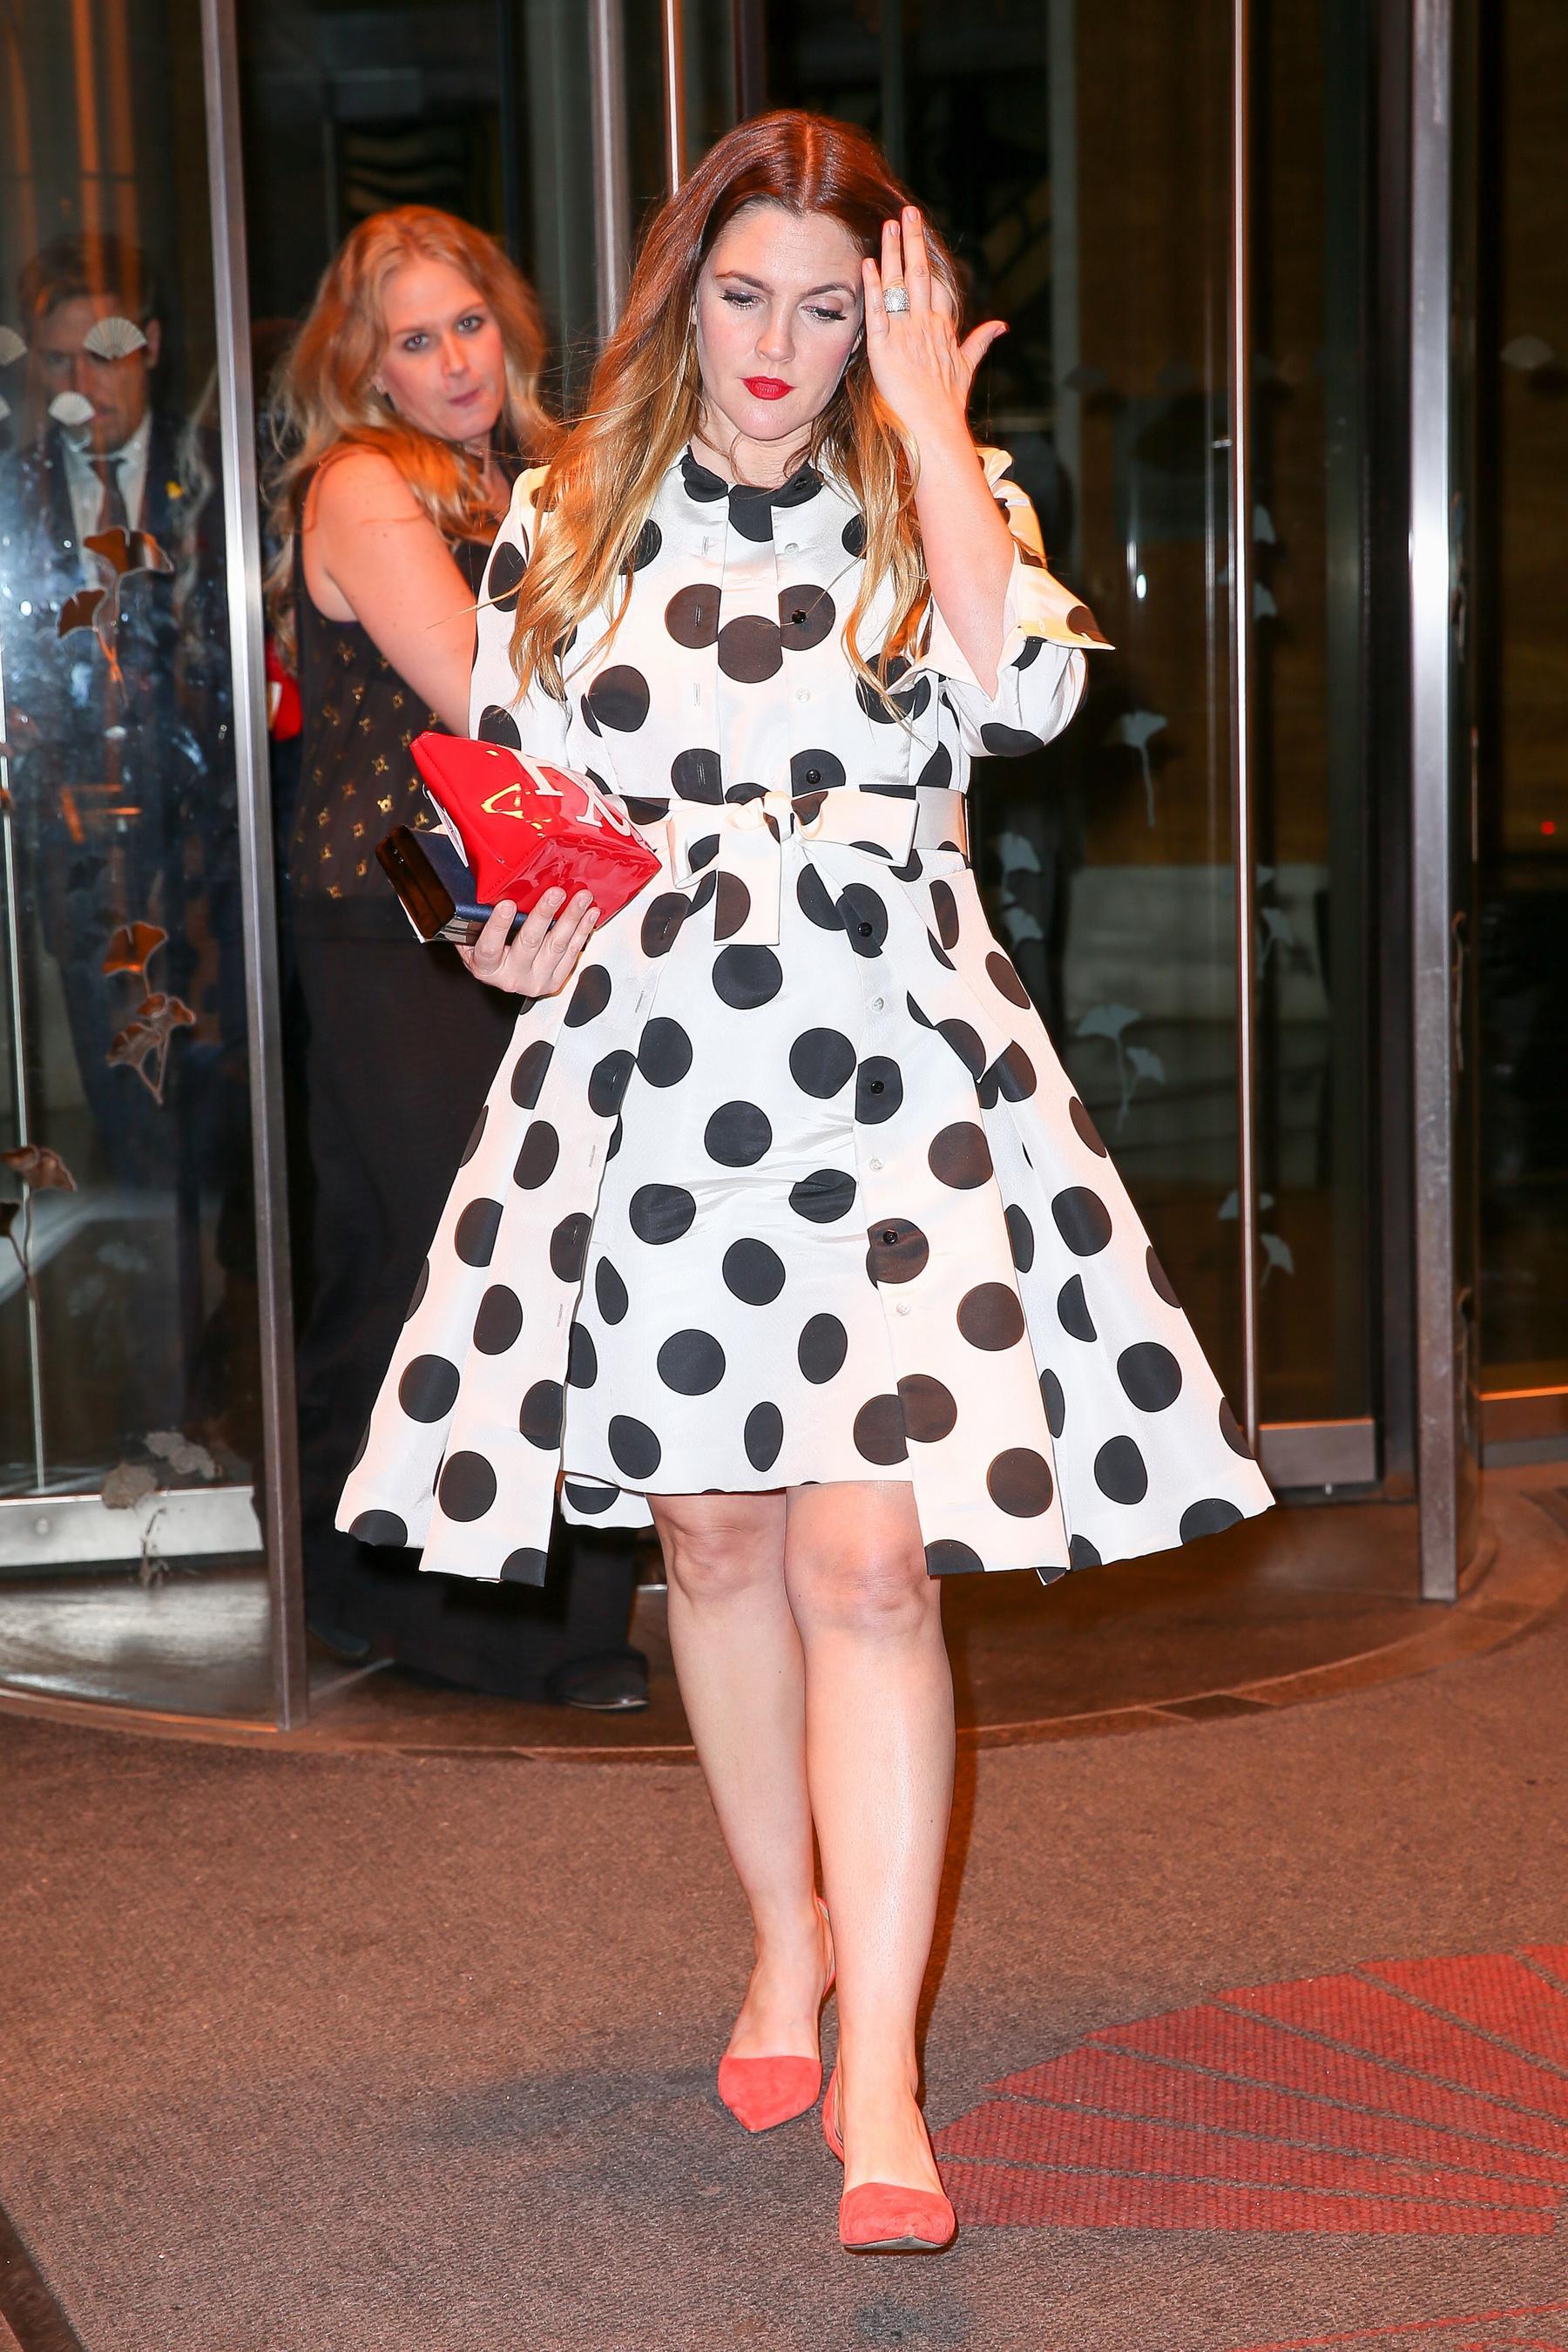 Drew Barrymore in New York City Jan-2